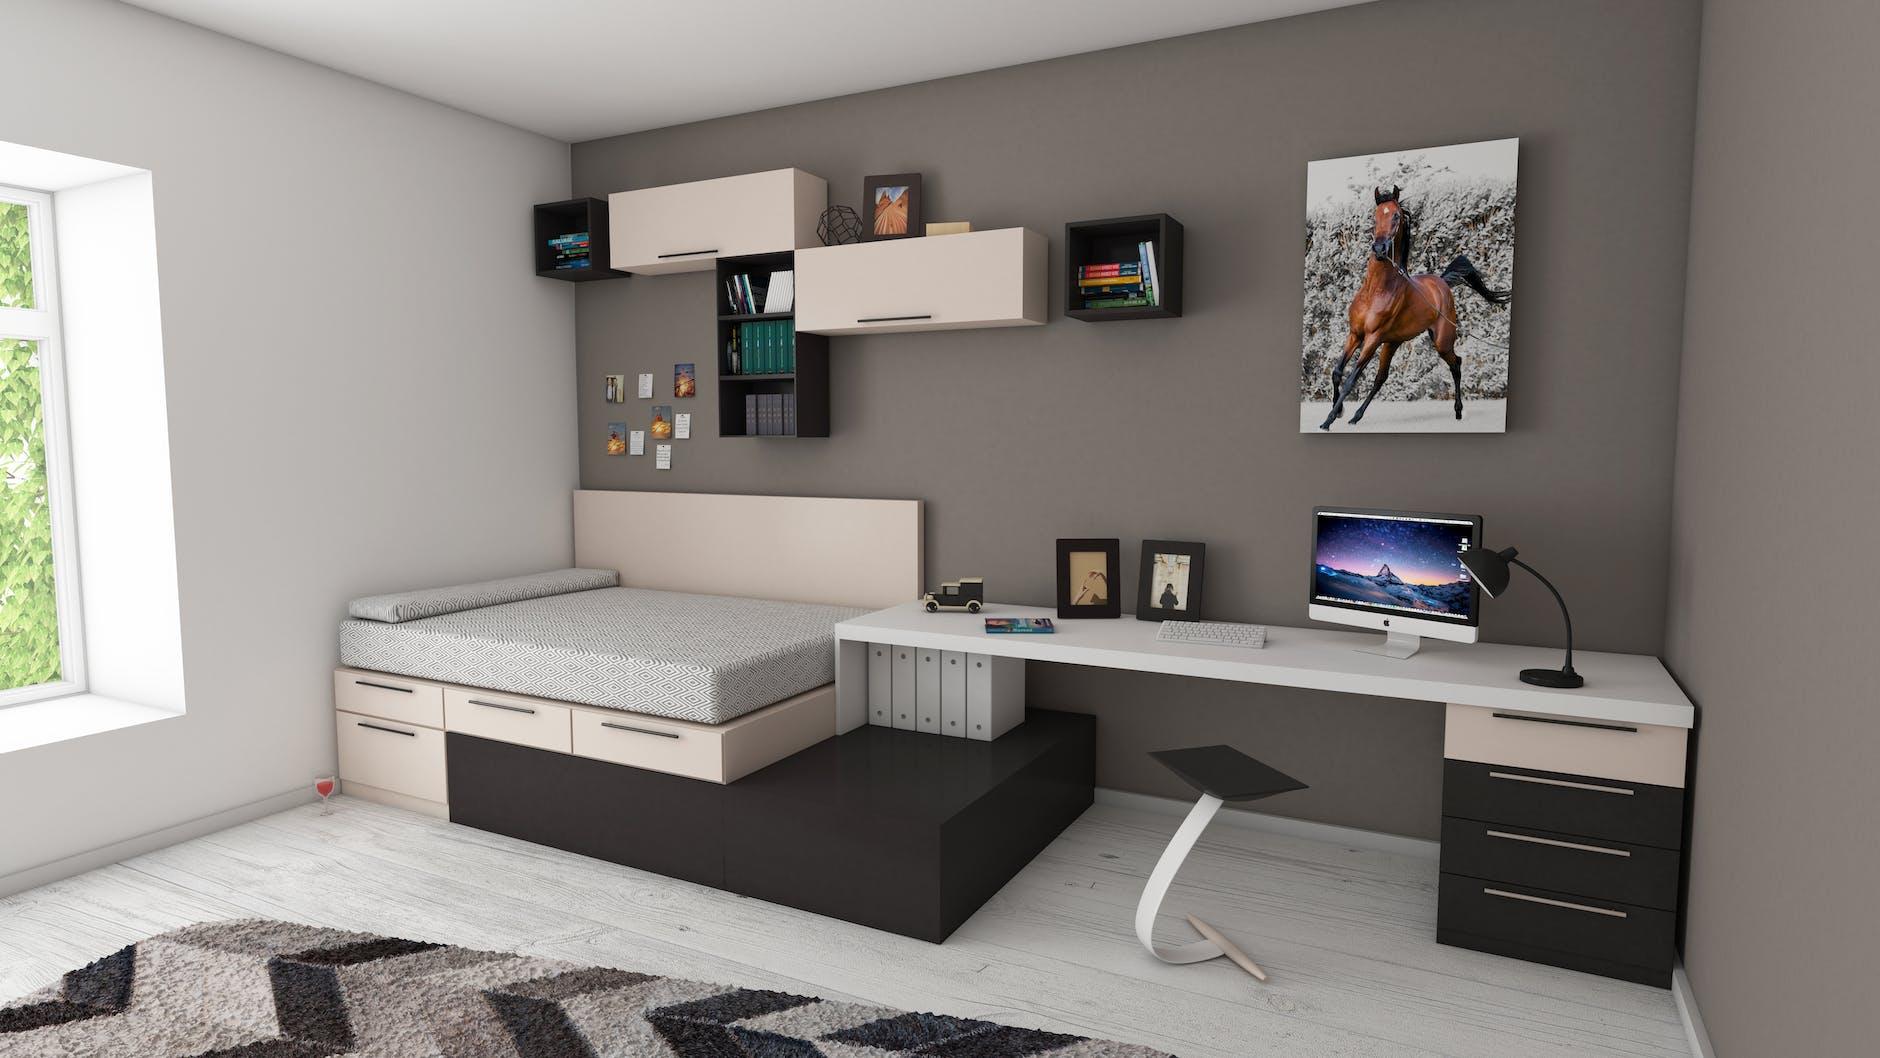 Embrace minimalism